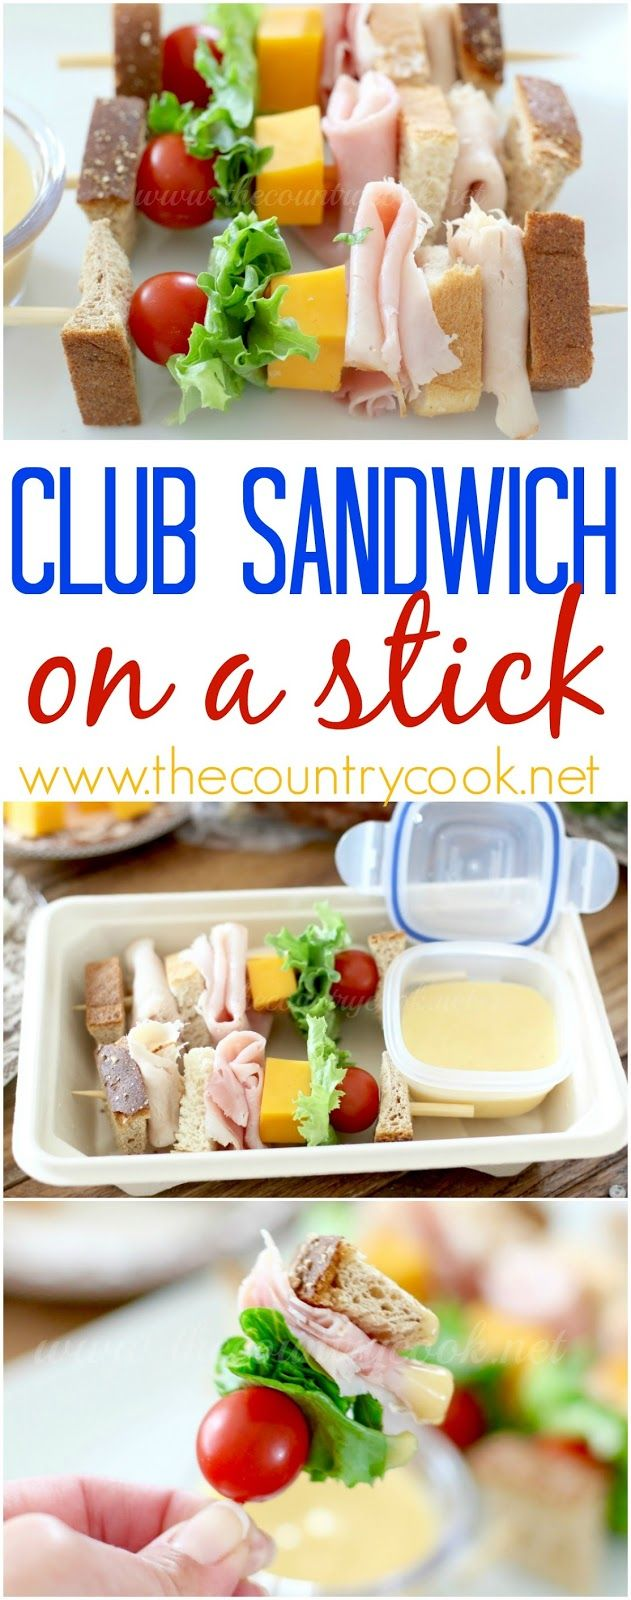 100 club sandwich recipes on pinterest chicken club